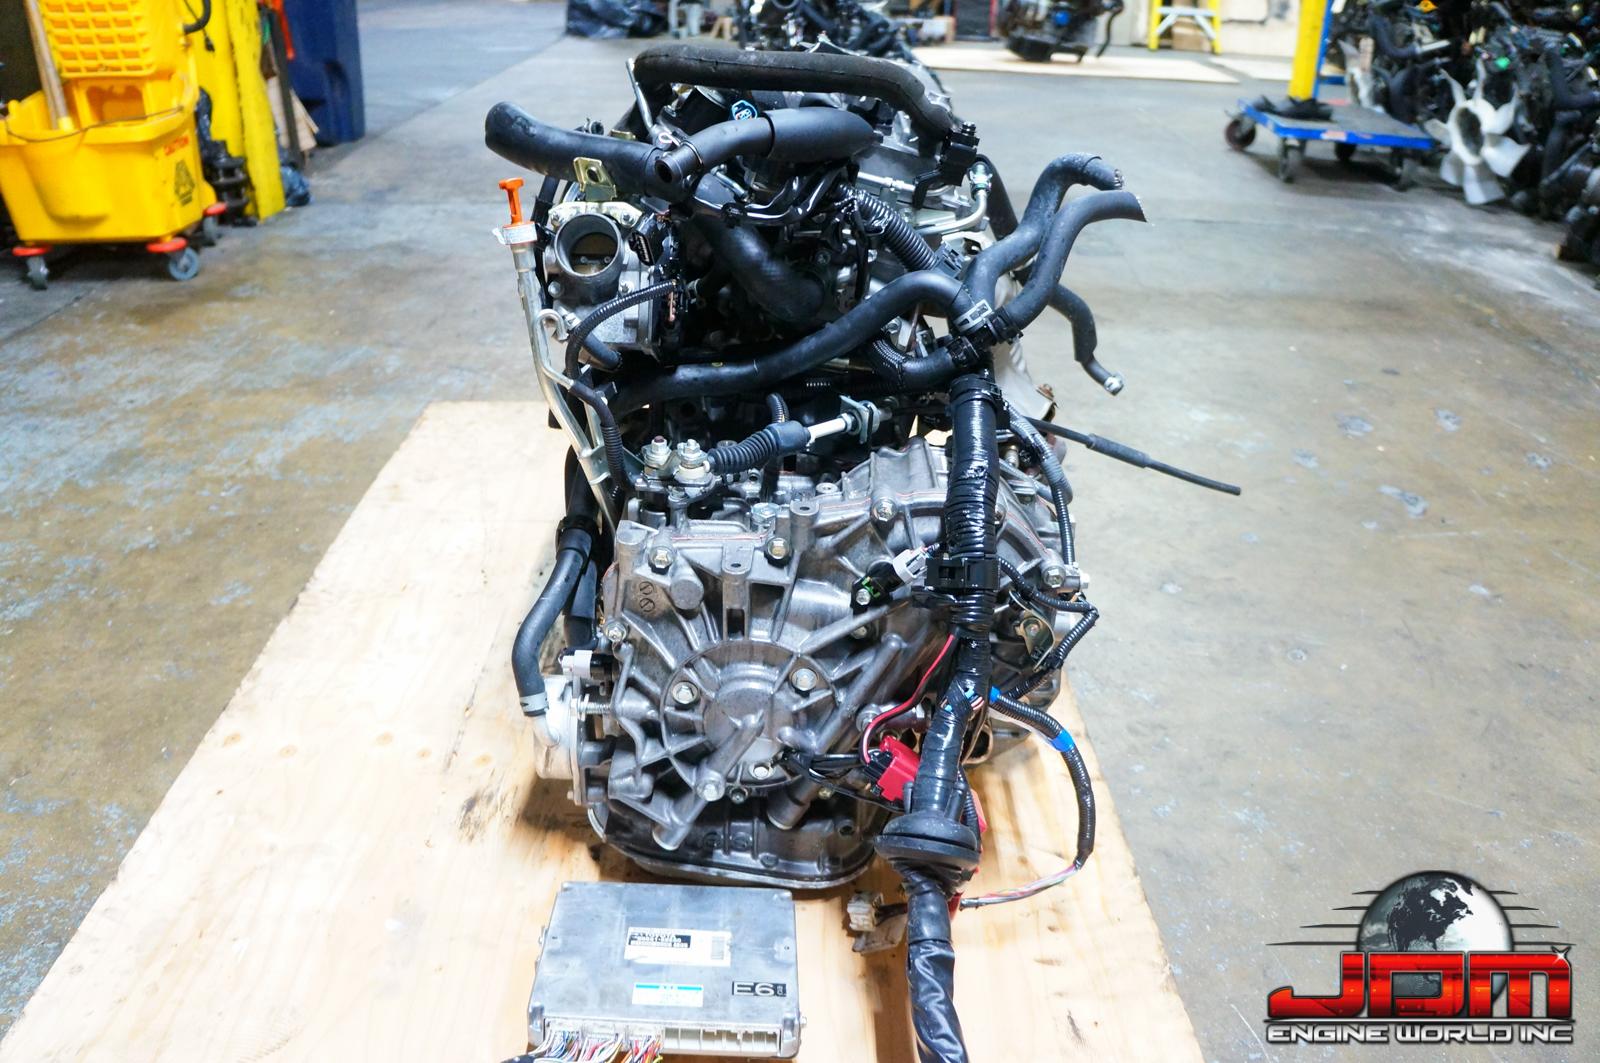 TOYOTA 1NZ-FE ENGINE & CVT AUTOMATIC TRANSMISSION VVTi 1.5L JDM 1NZ